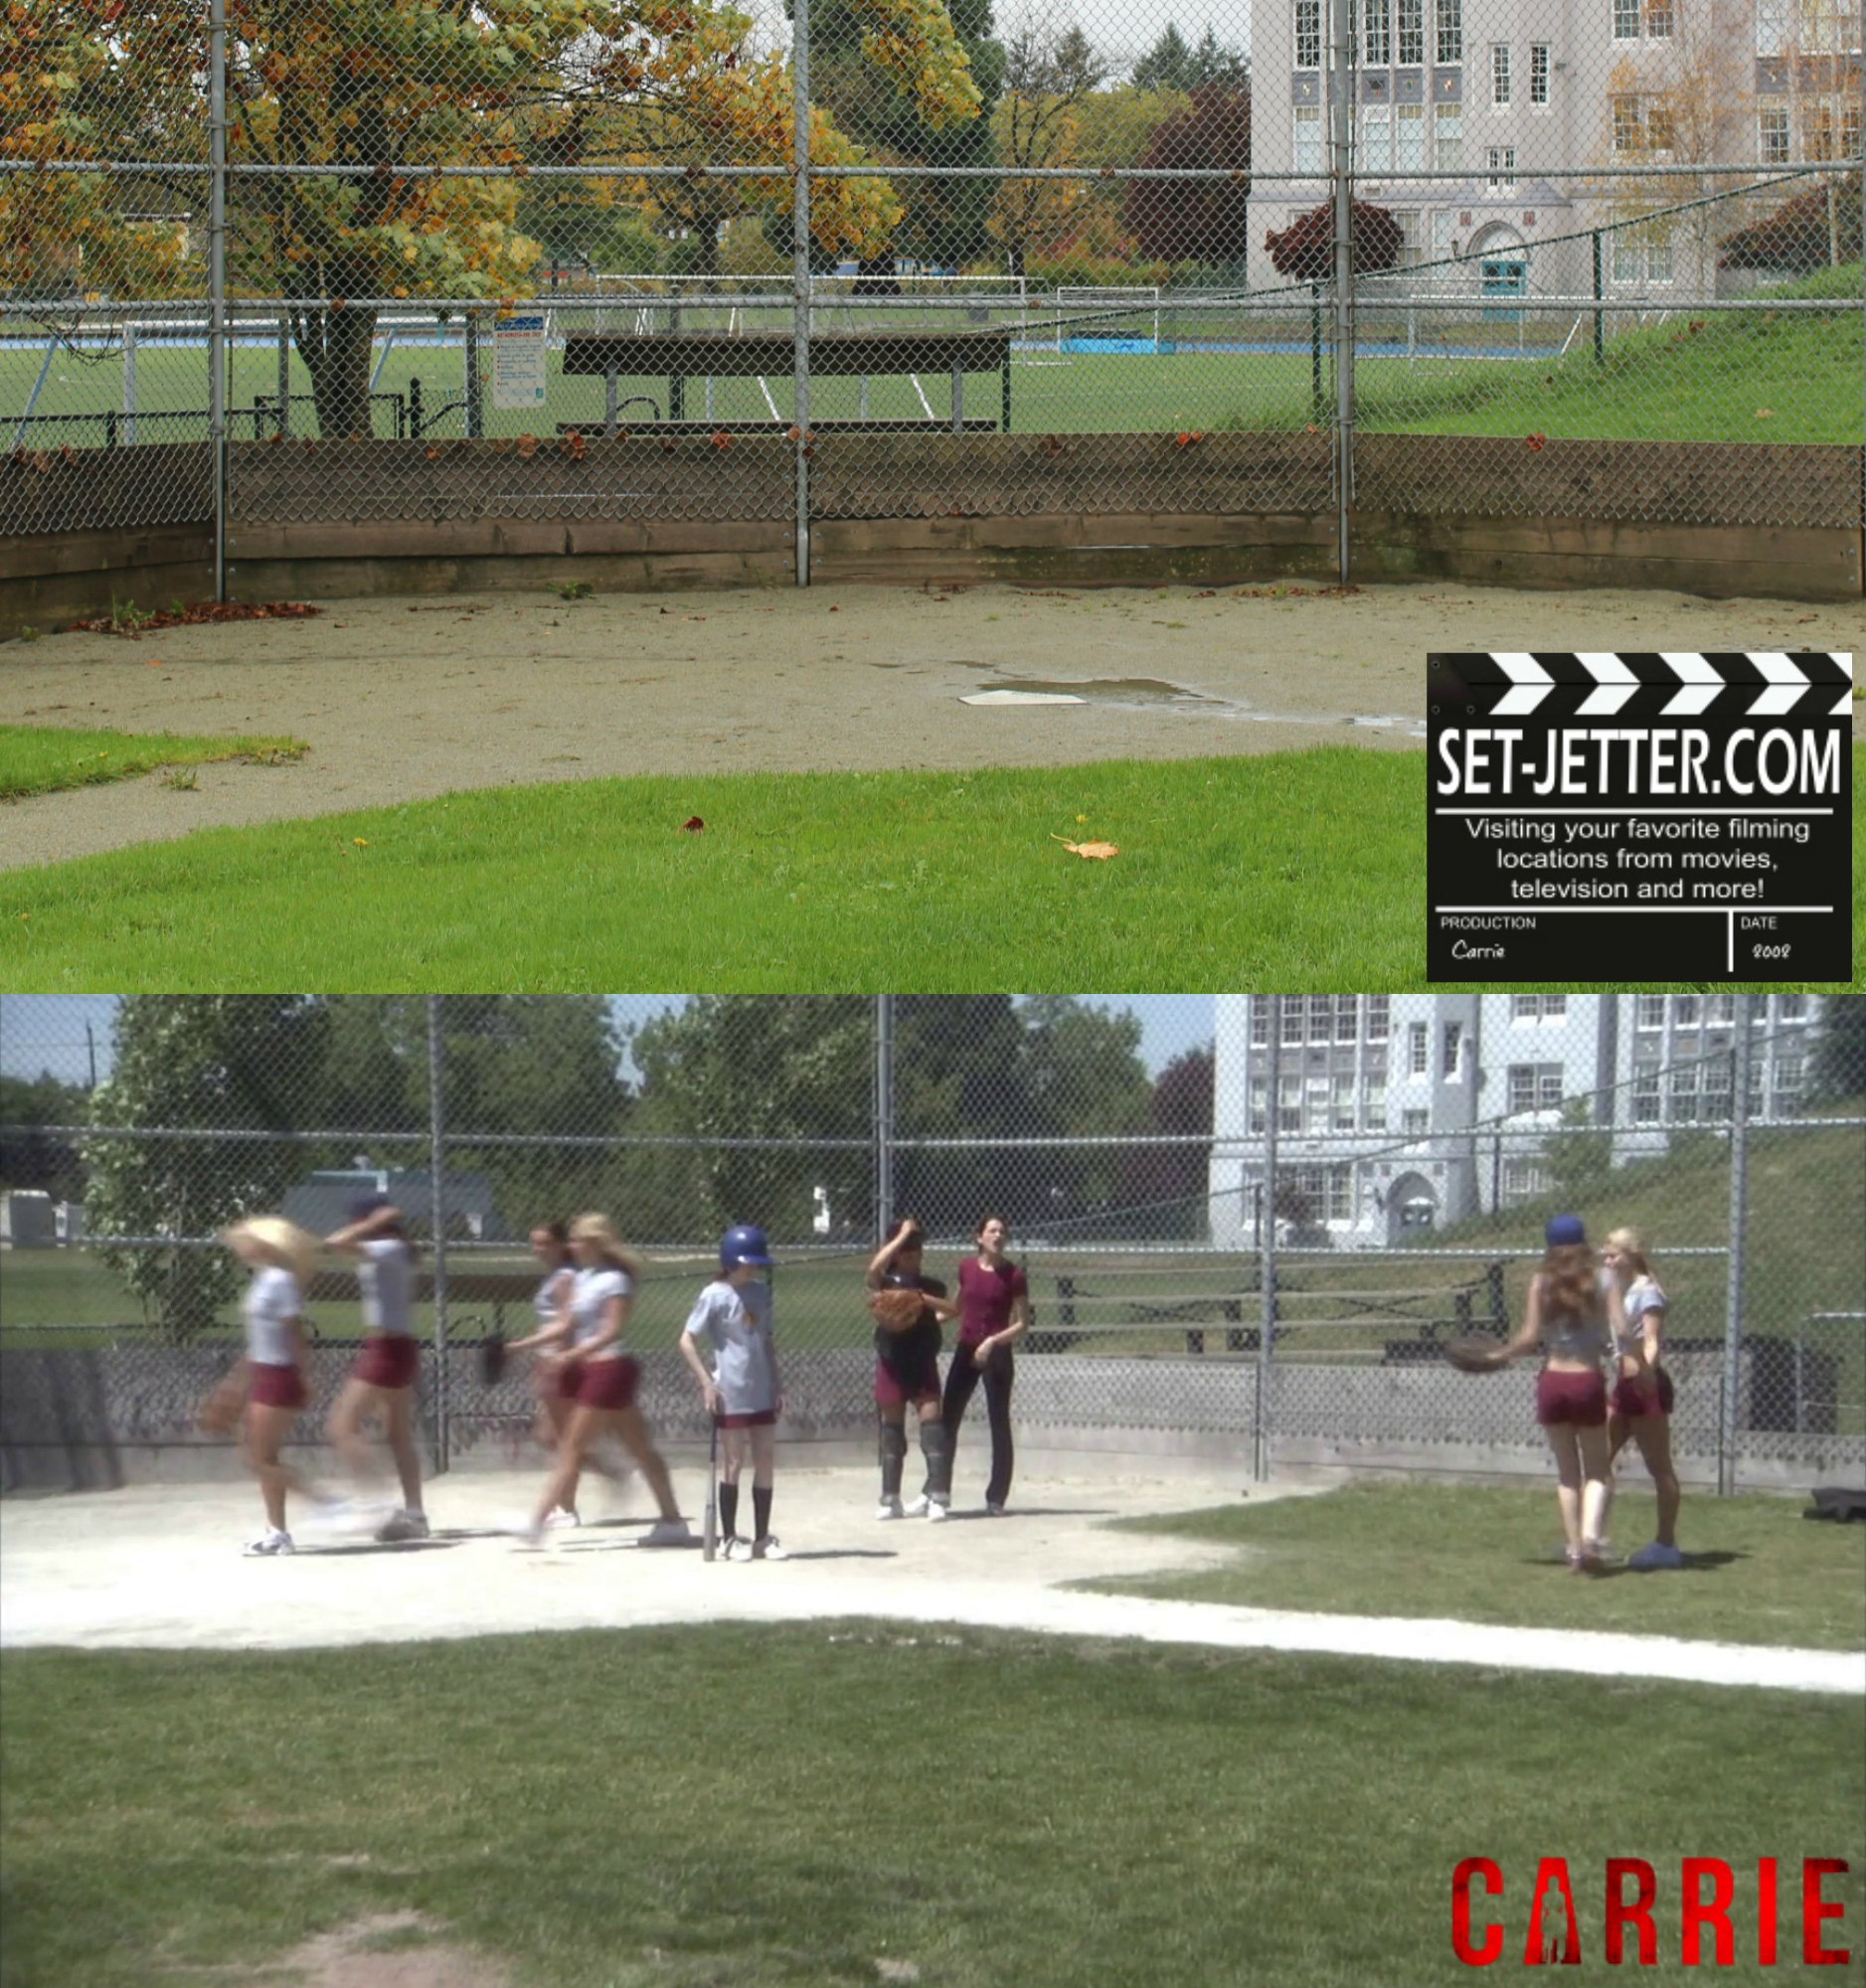 carrie 2002 comparison 07.jpg